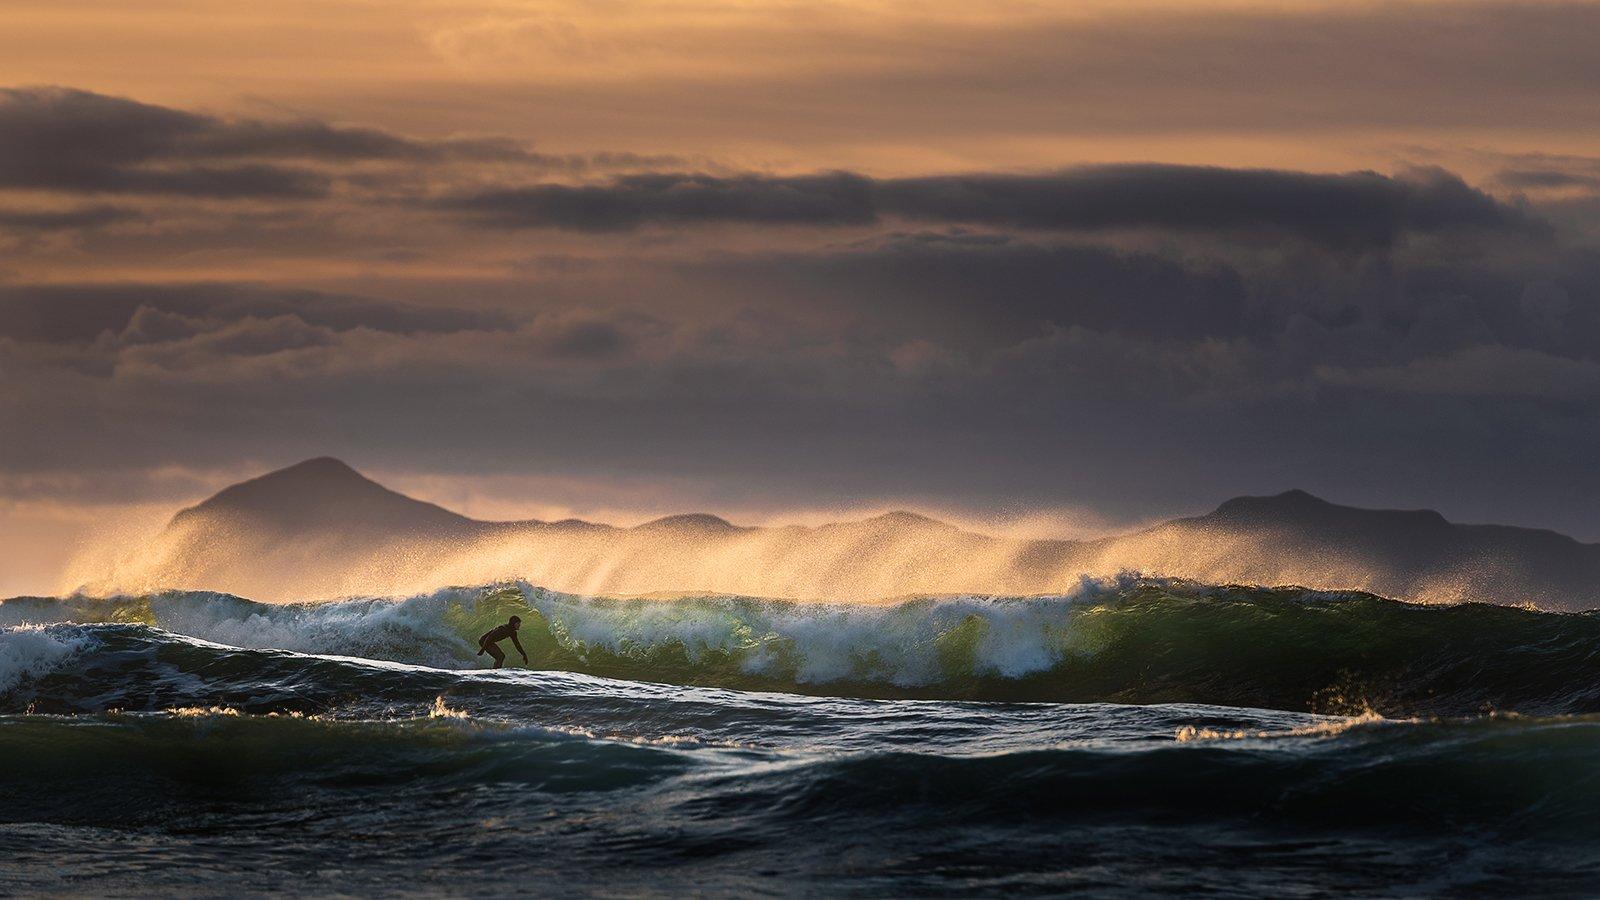 surfing,sport,action,mood,norway,sea,wave,sunset,people, Tomek Orylski